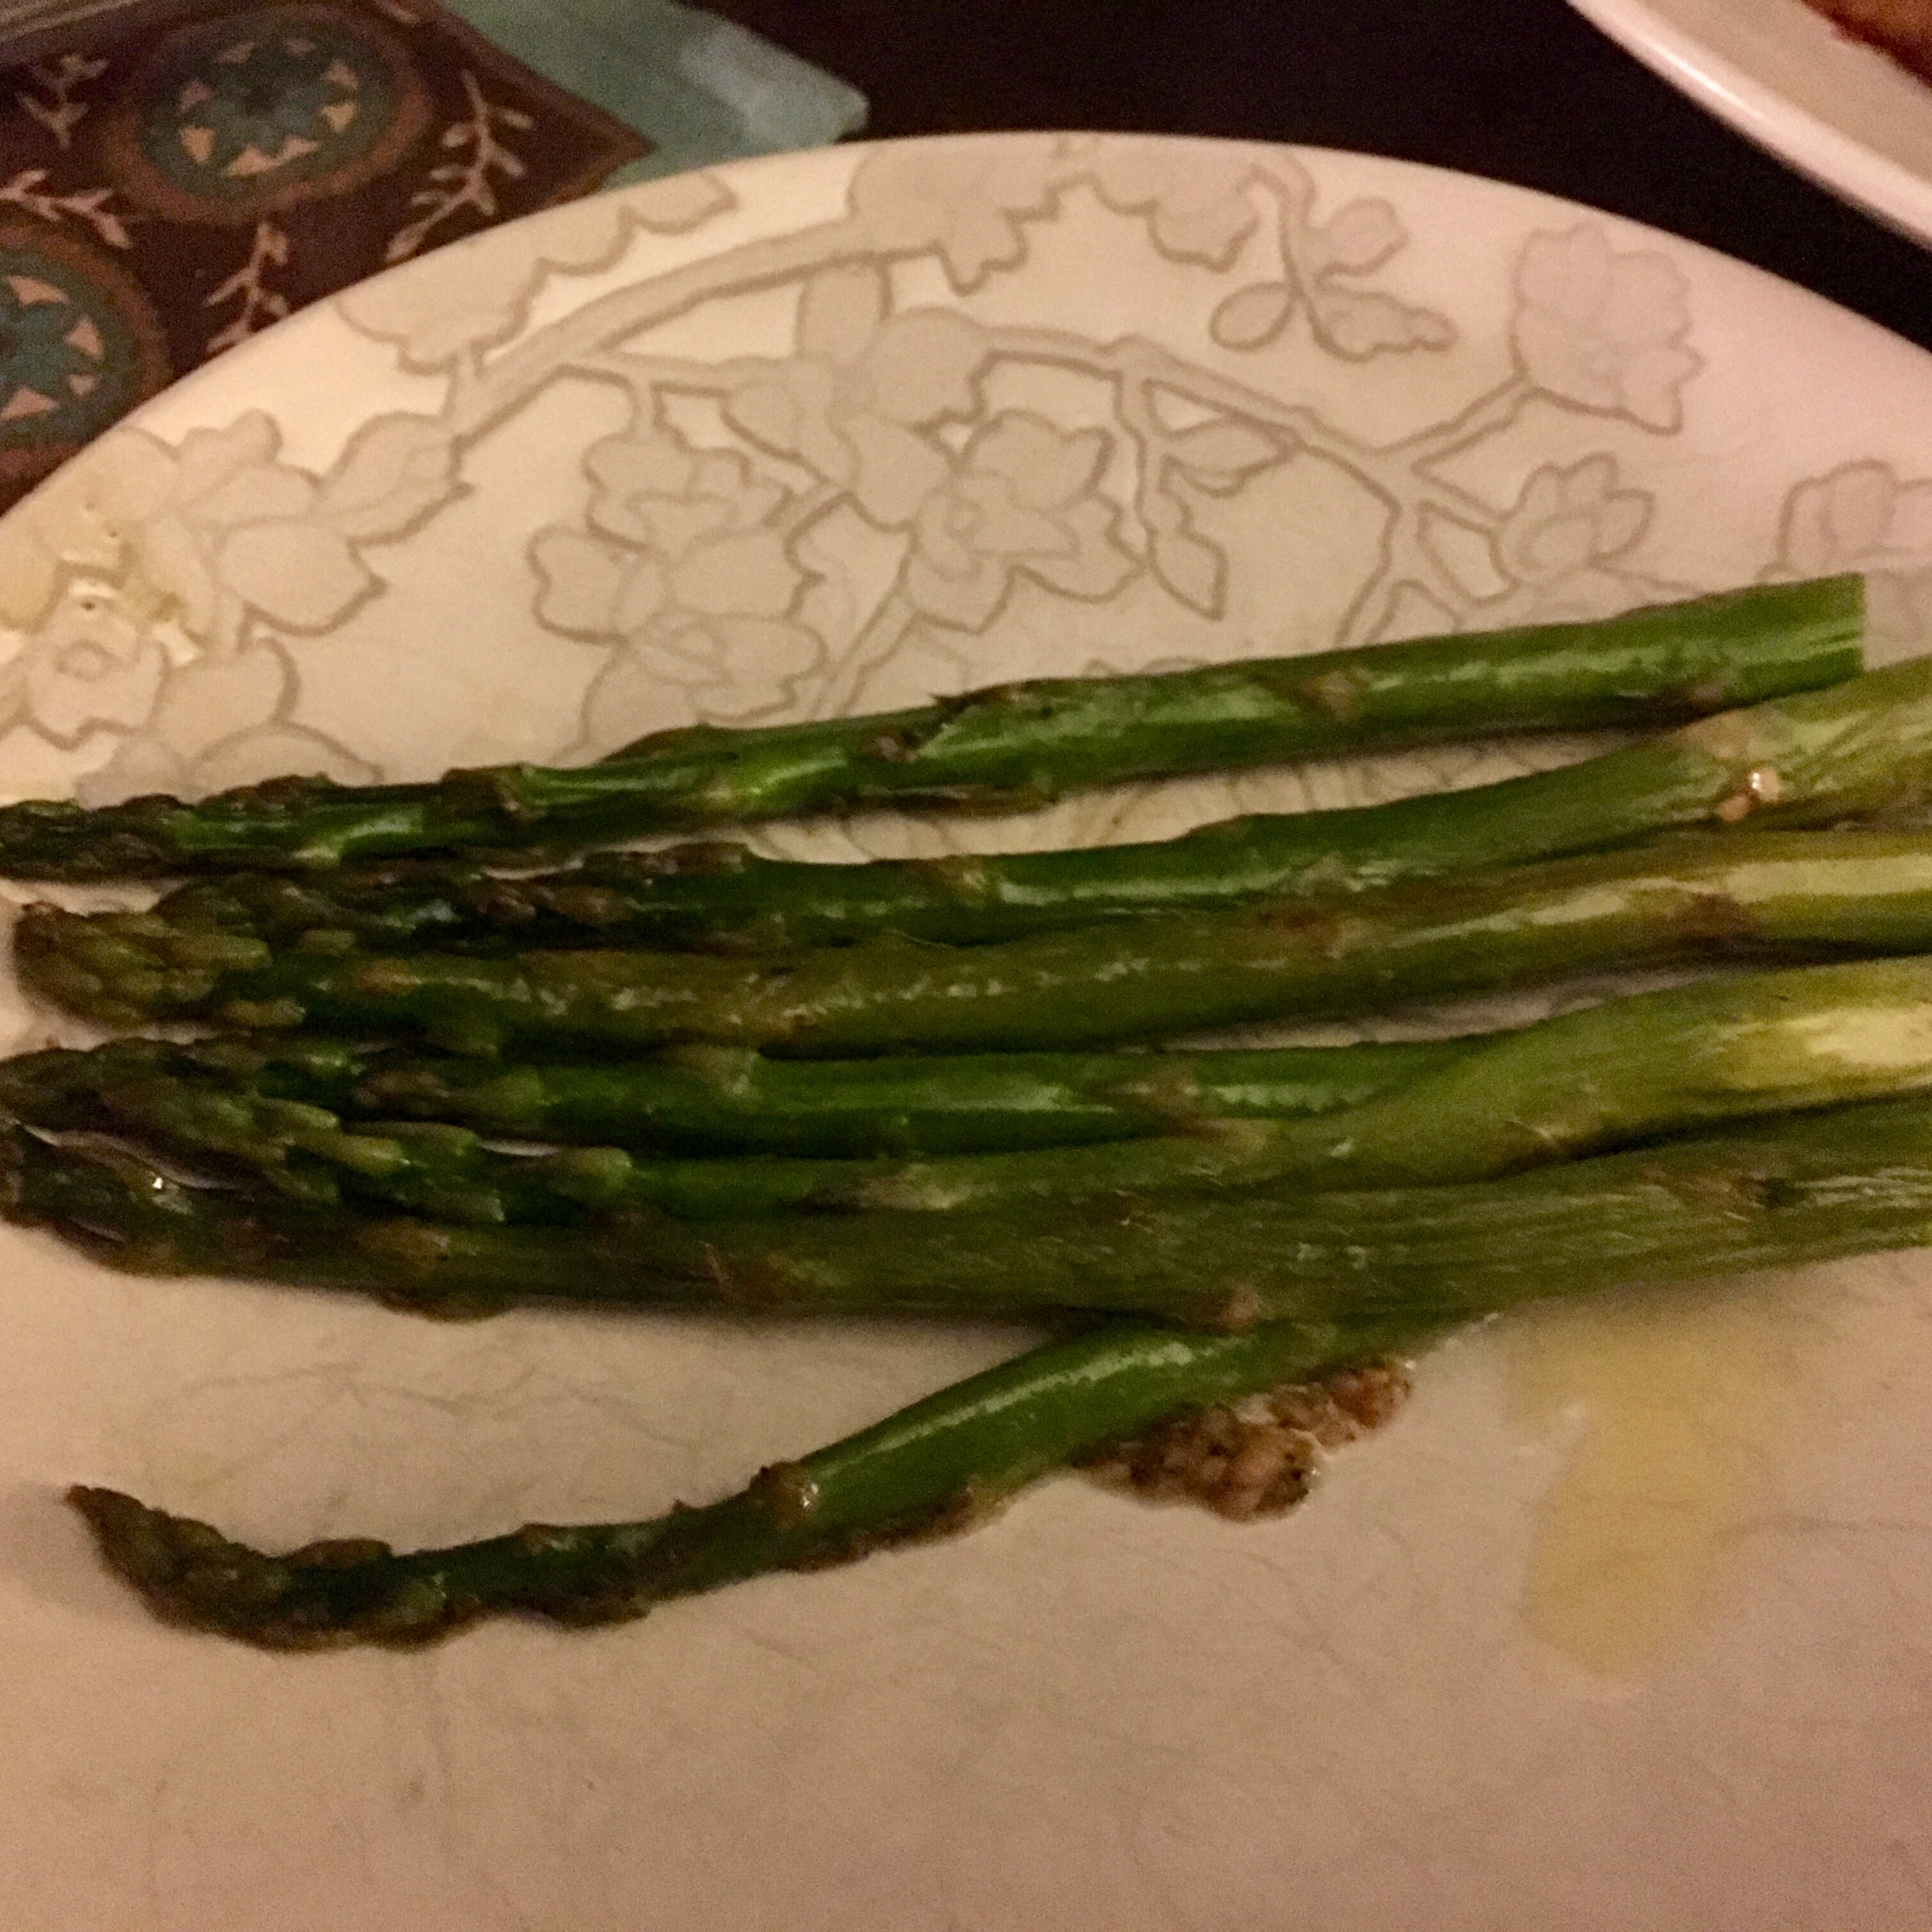 Pan-Fried Asparagus daranee